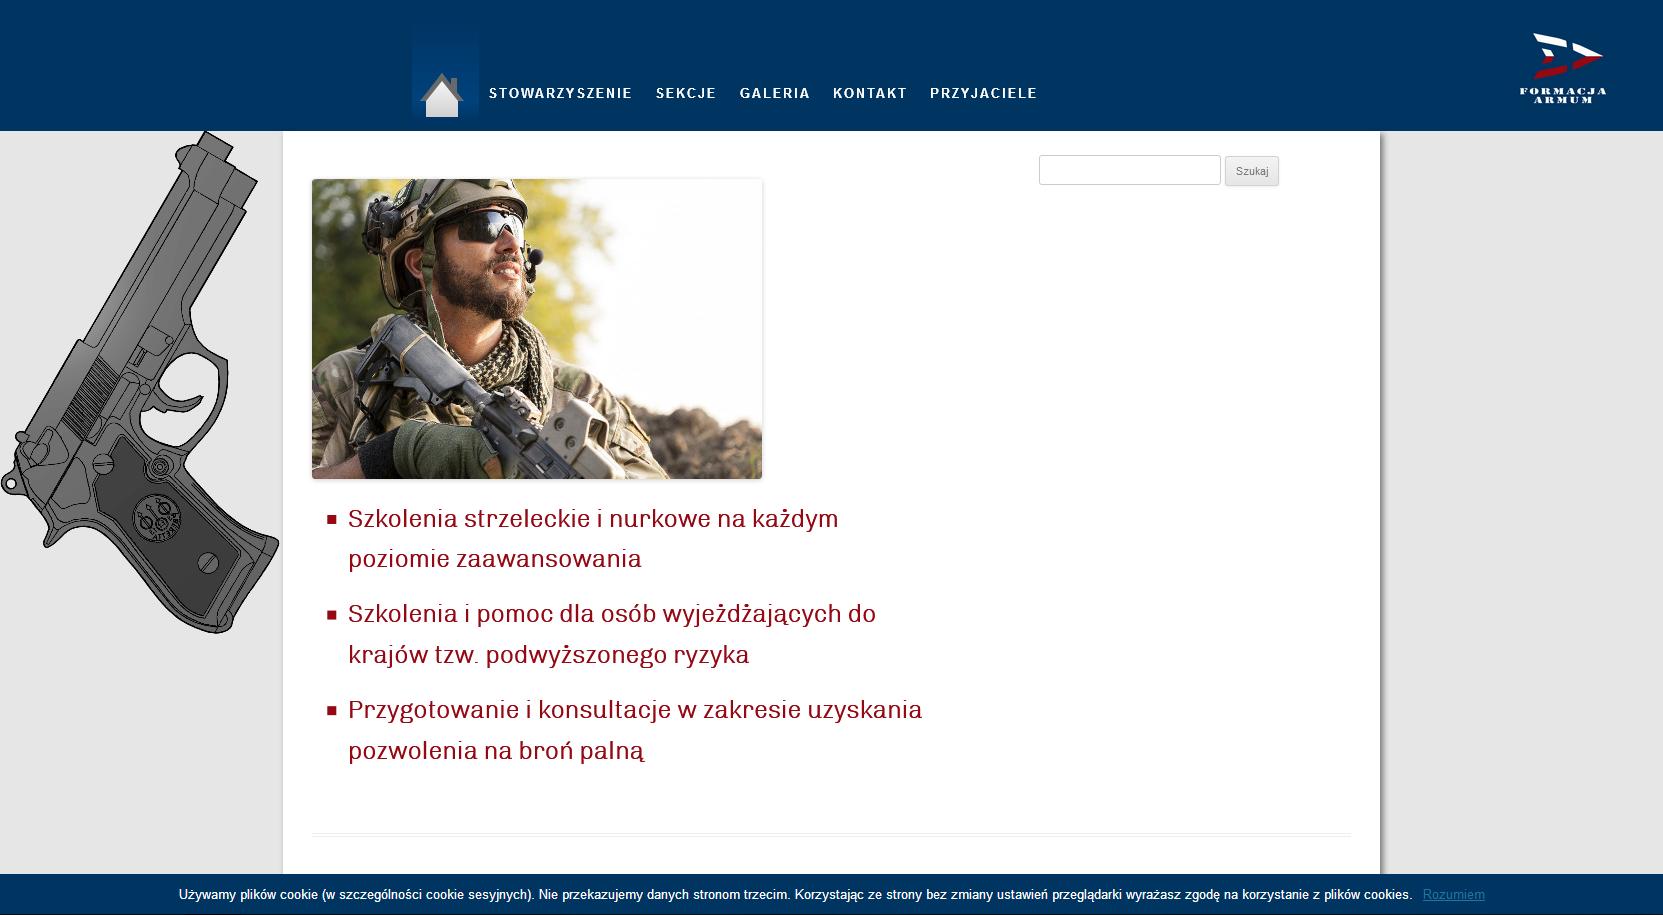 armum.pl obecnie